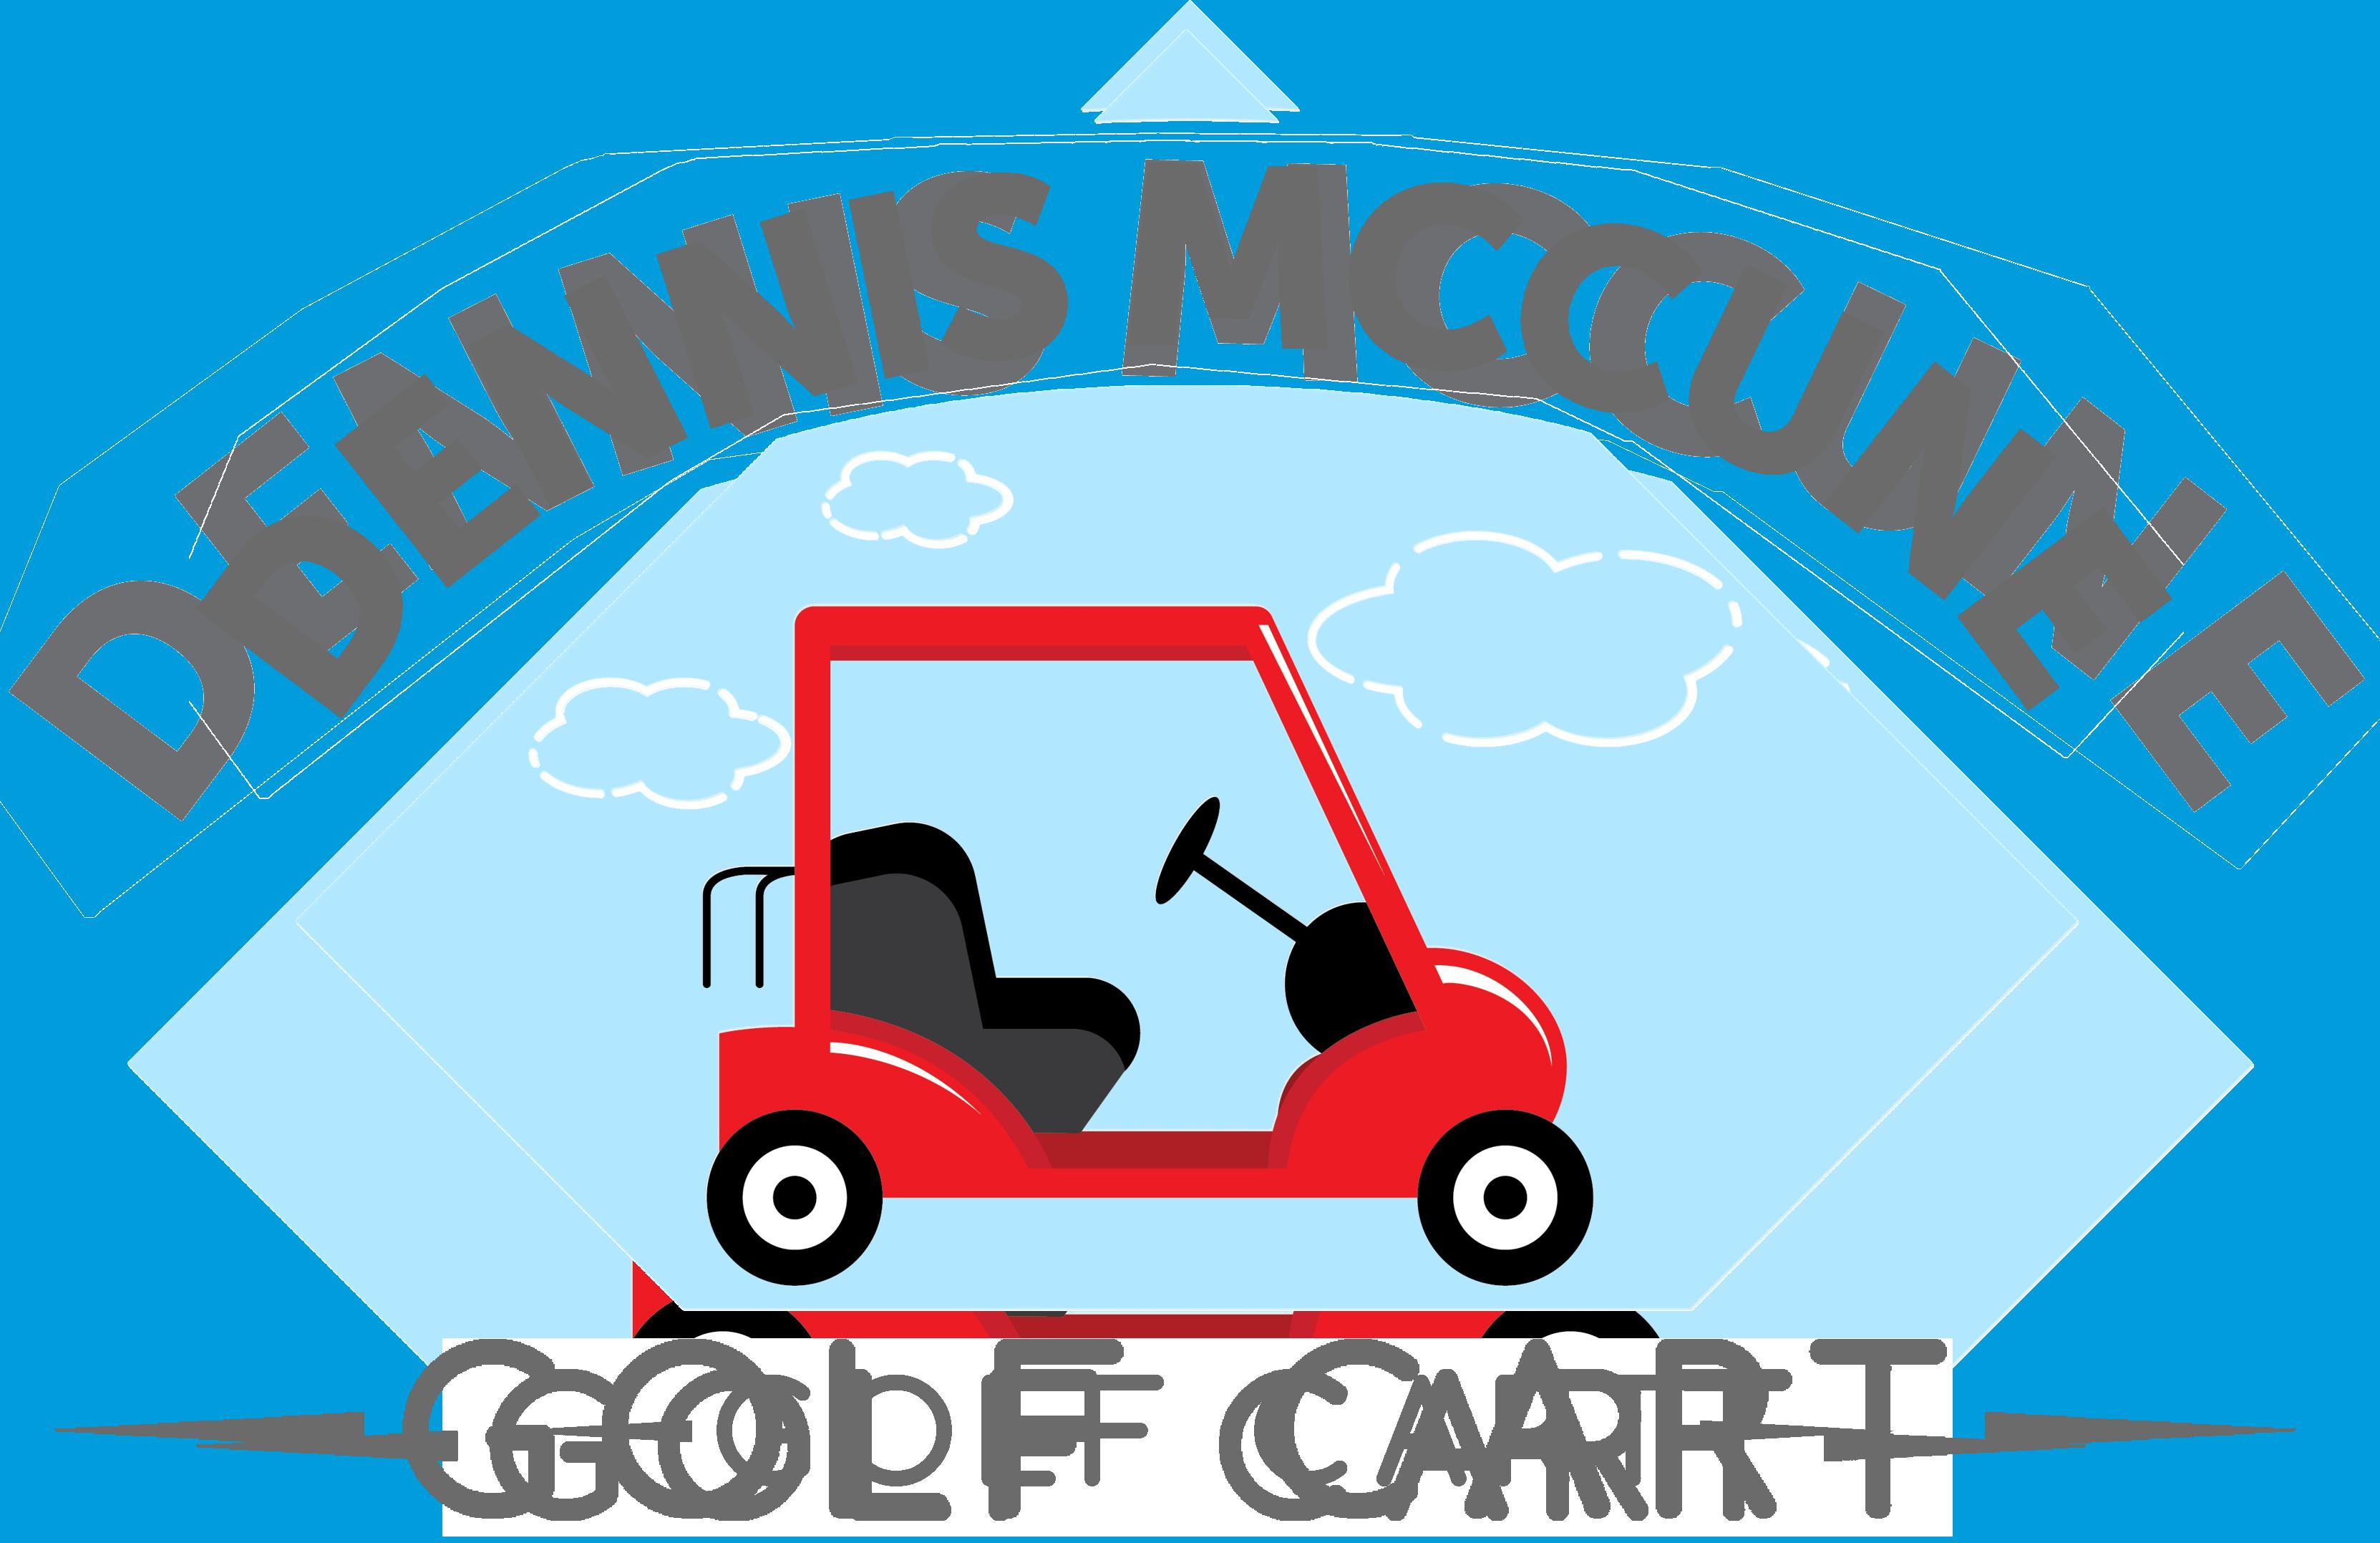 Dennis mccune florida cart. Golf clipart golf buggy